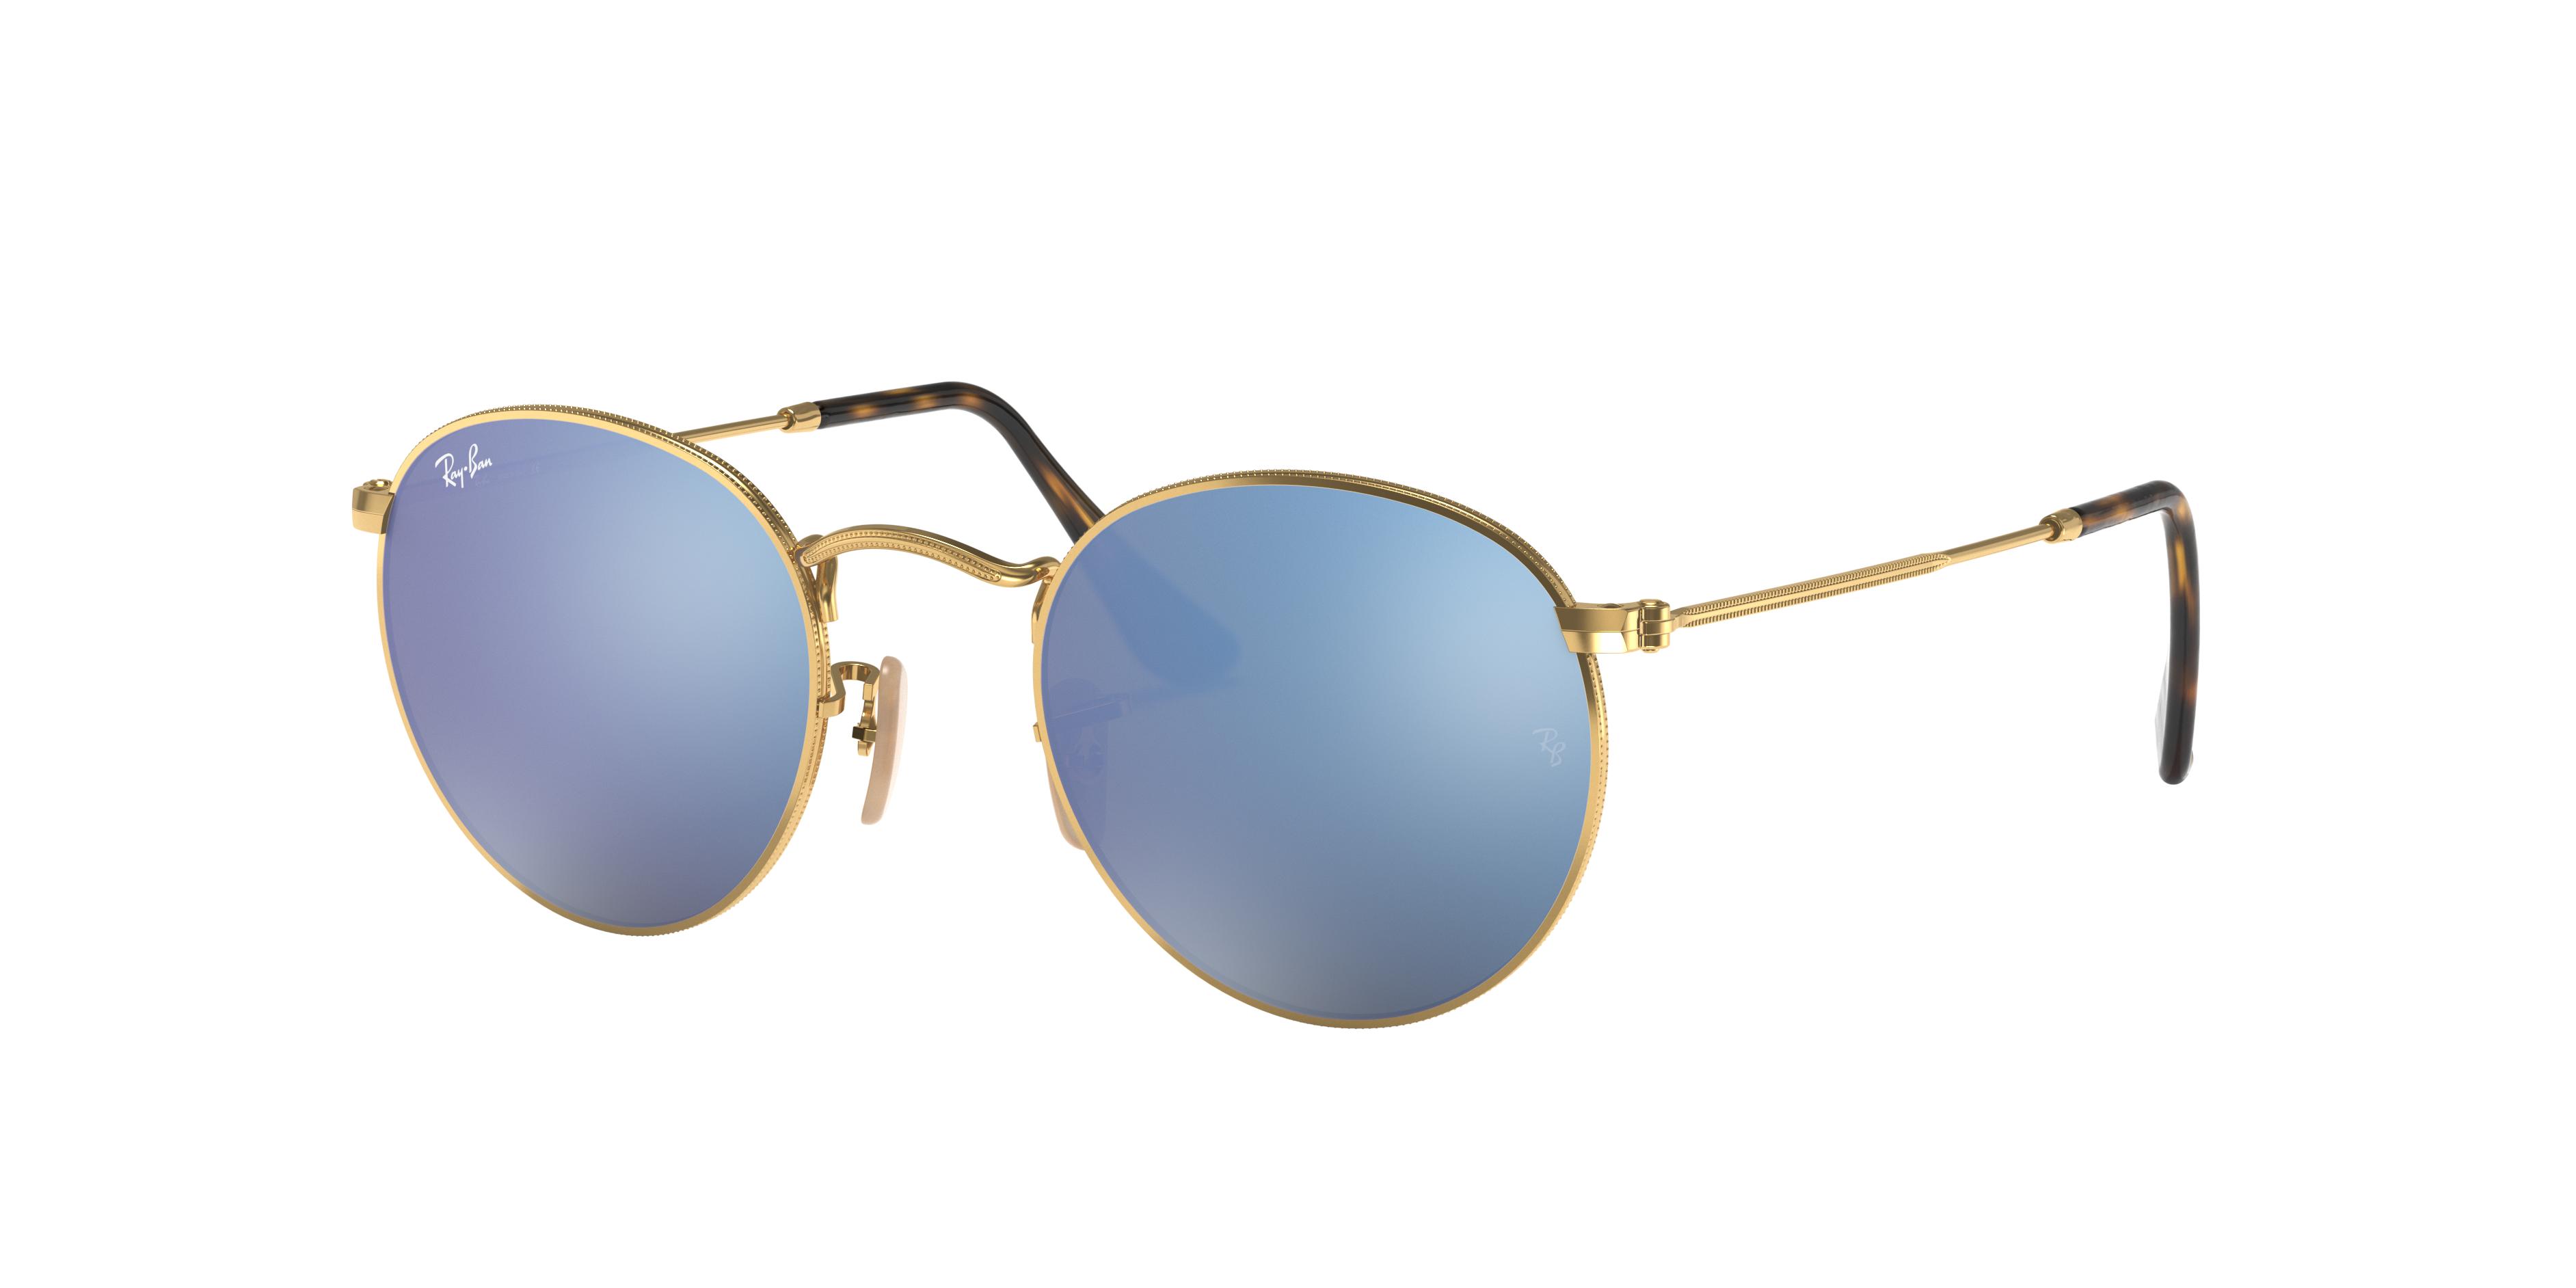 Ray-Ban Round Flat Lenses Gold, Blue Lenses - RB3447N